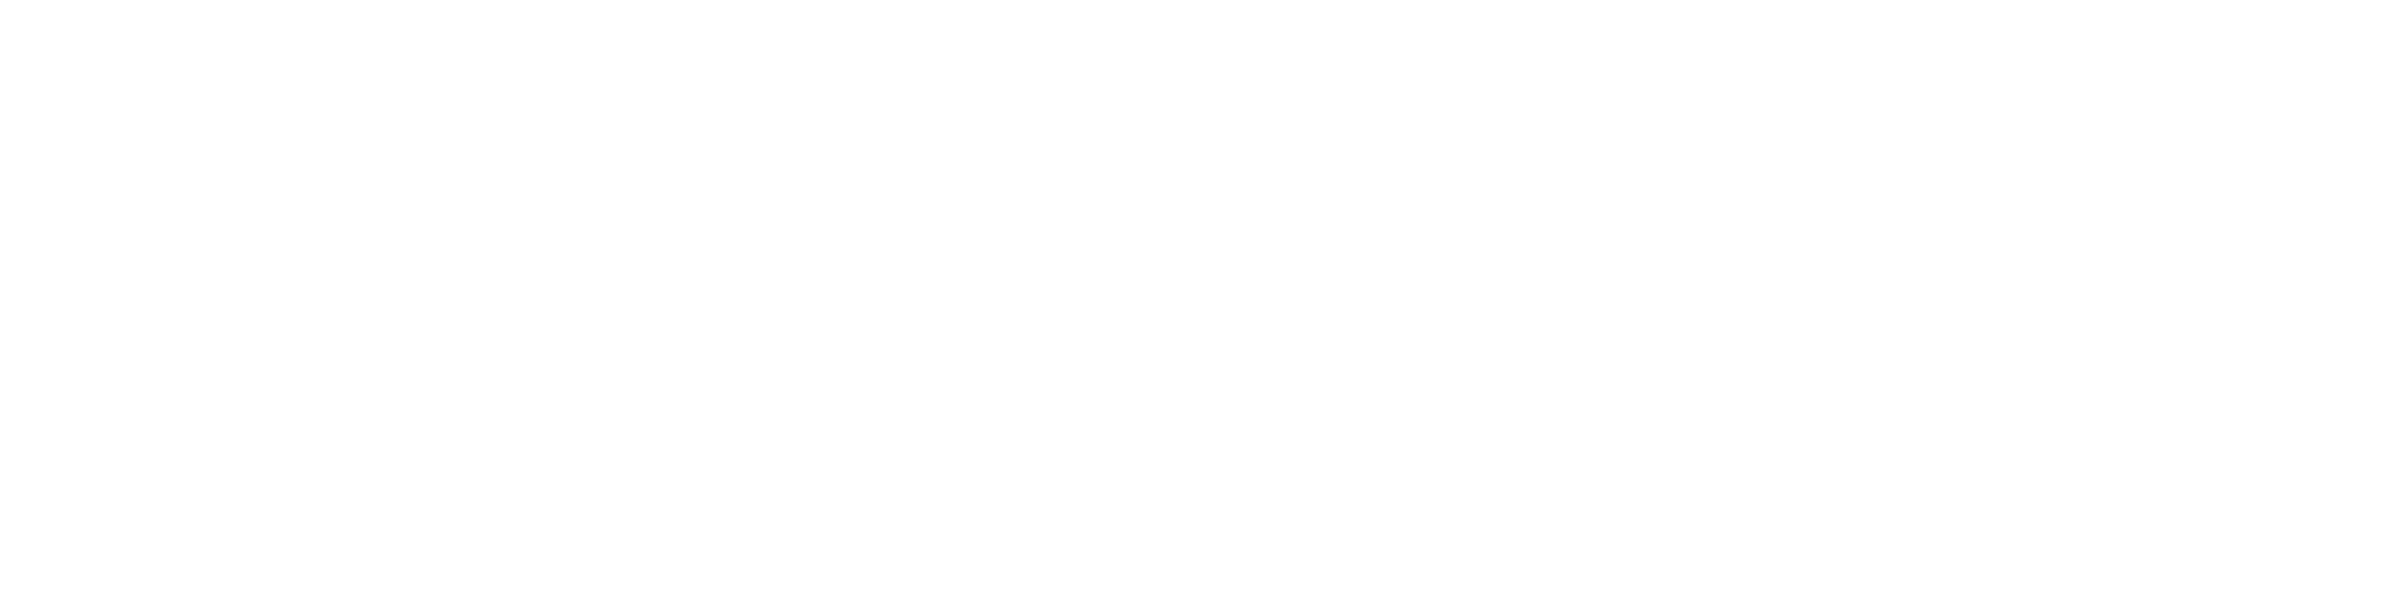 Logo Kanzlei Meisterernst Rechtsanwälte